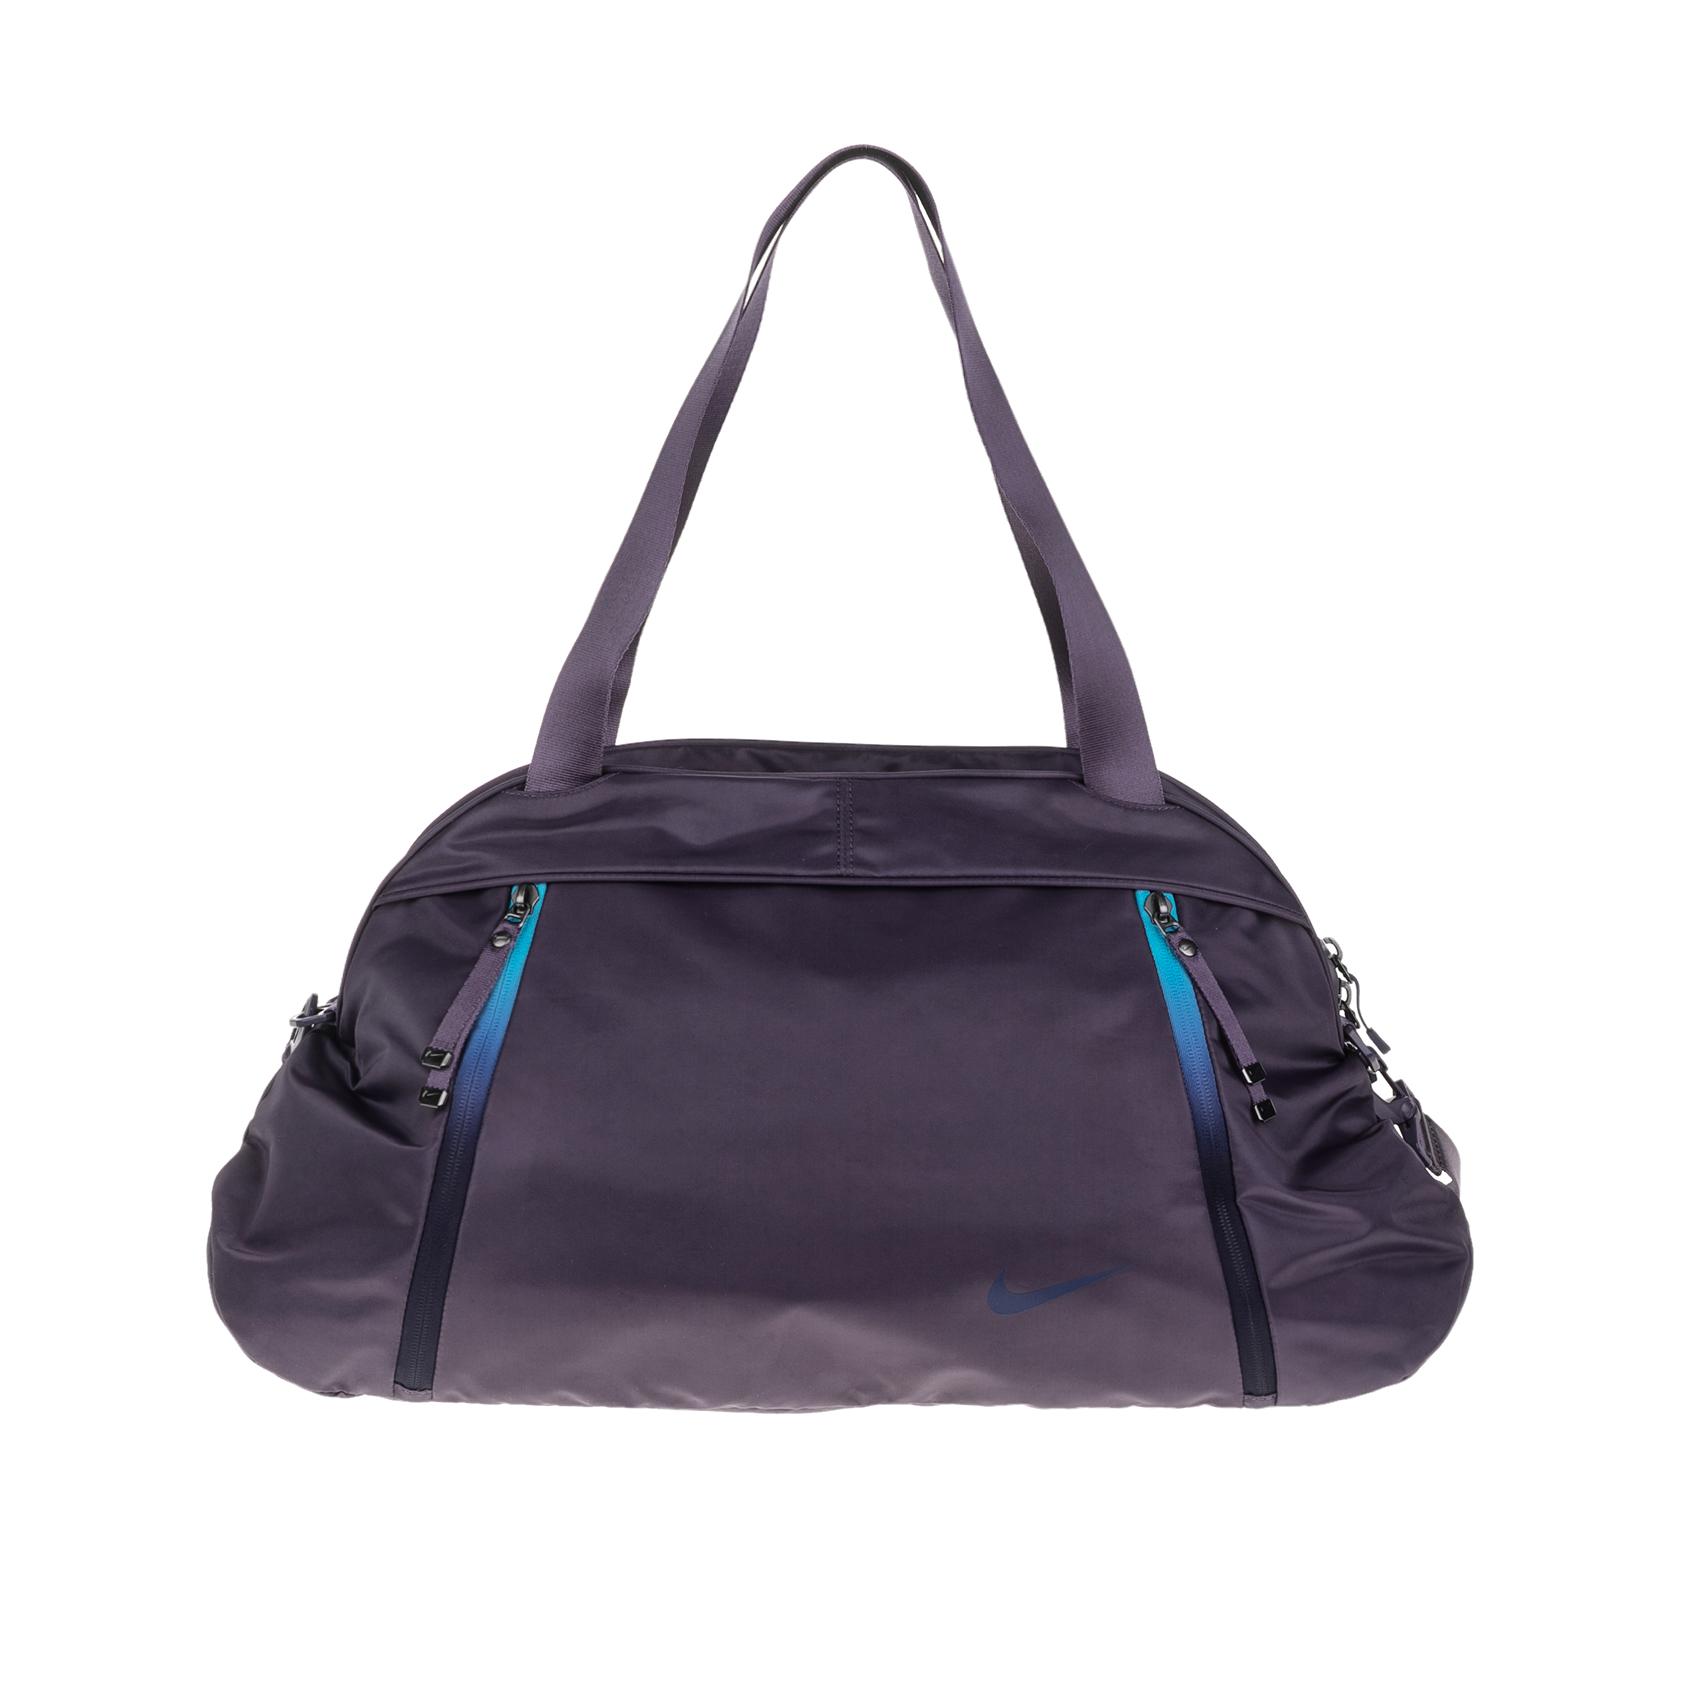 5fd4c847d7 NIKE - Γυναικείο σακίδιο Nike AURA CLUB - SOLID μπλε 1468782.1-B917